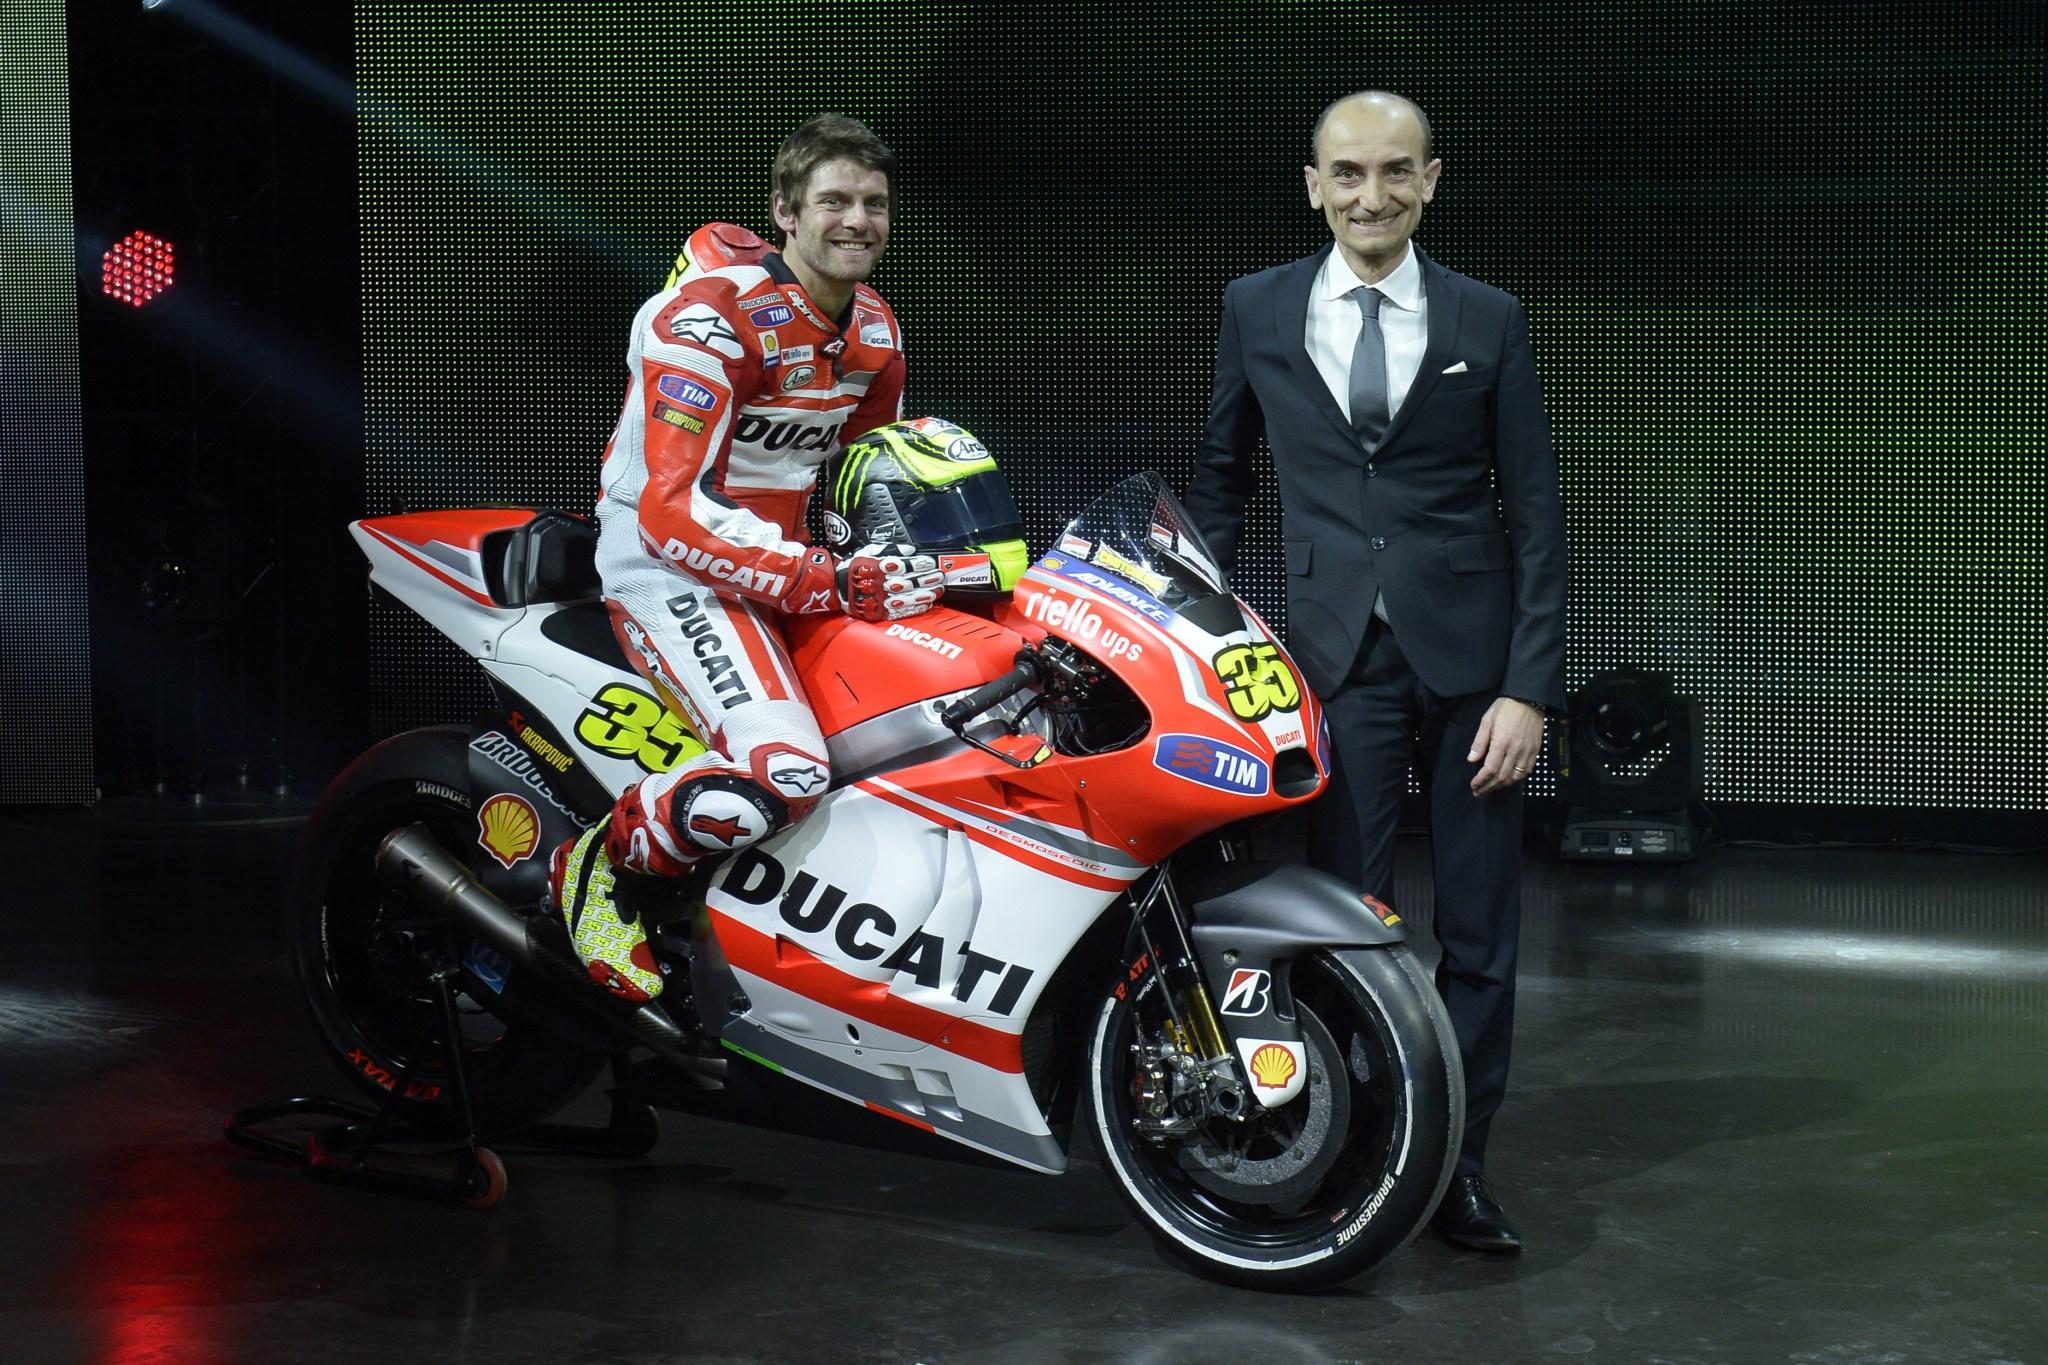 Ducati 2014 Motogp Team Presented In Germany Autoevolution